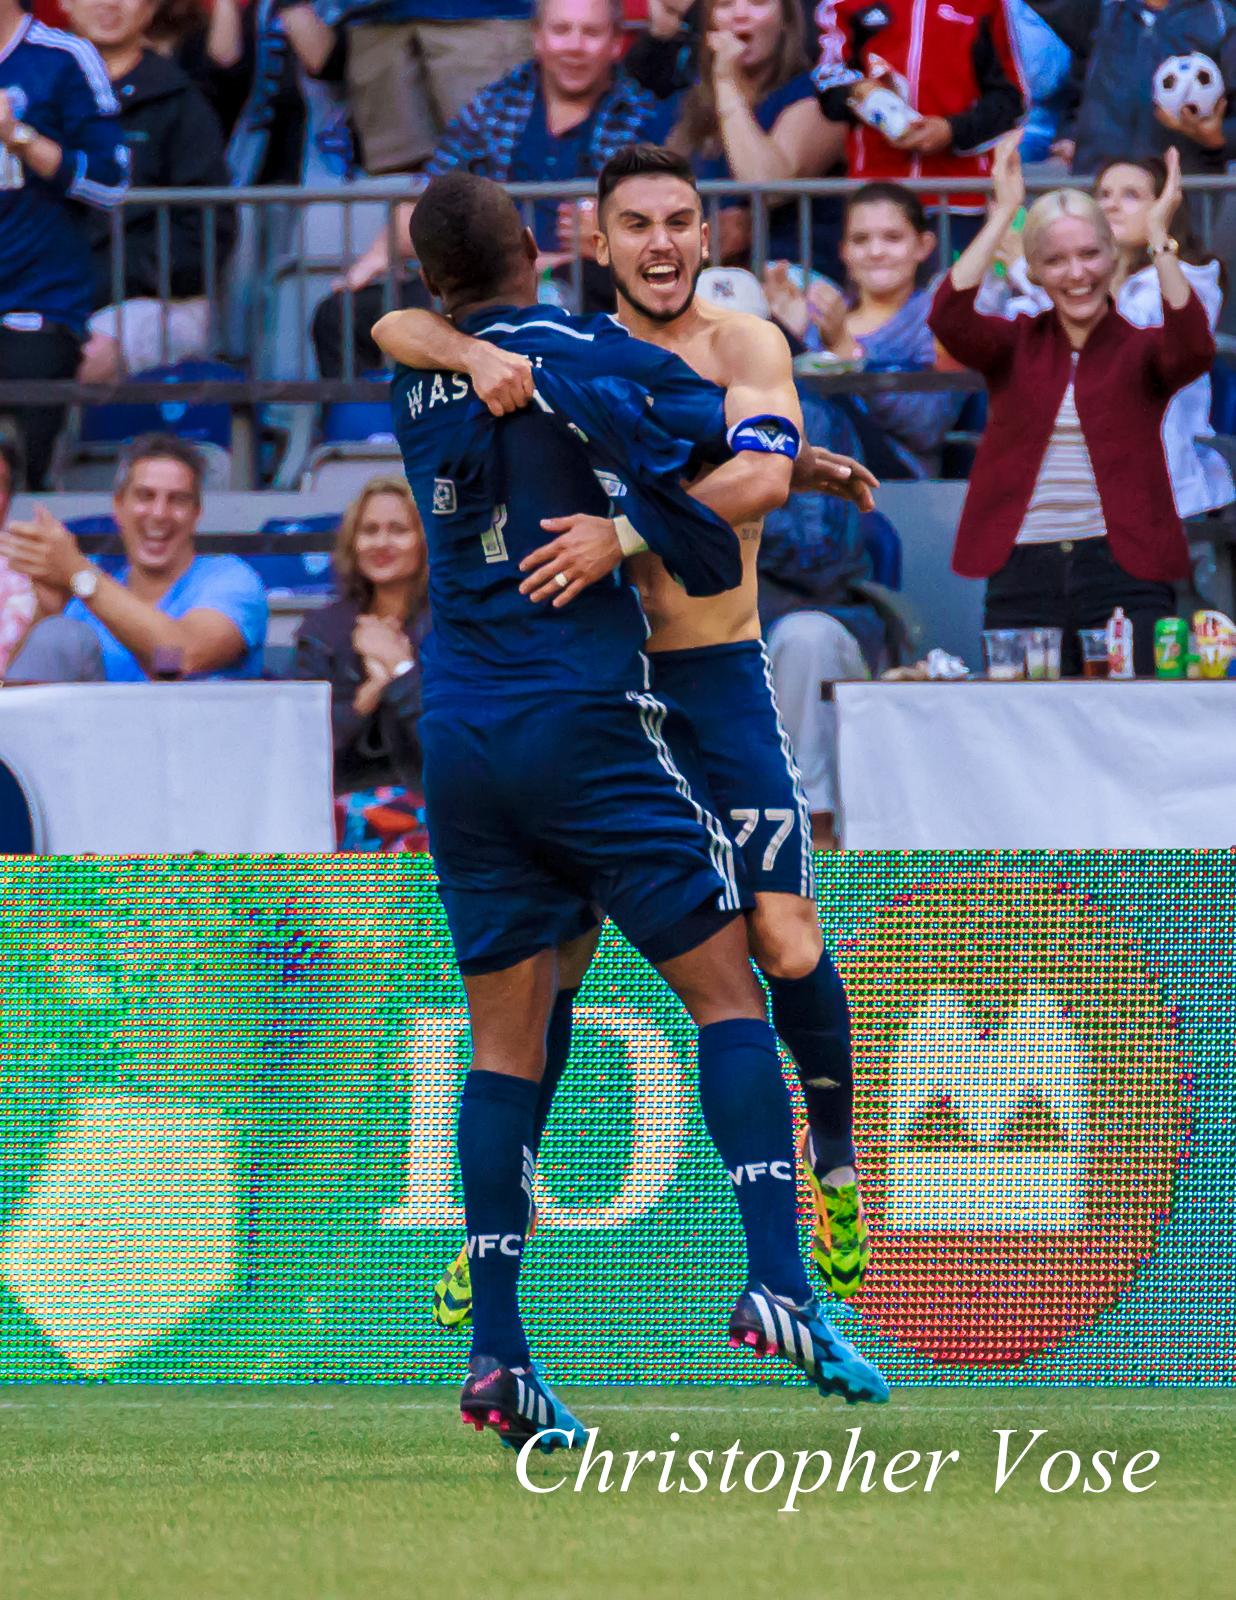 2014-09-27 Pedro Morales Second Goal Celebration.jpg